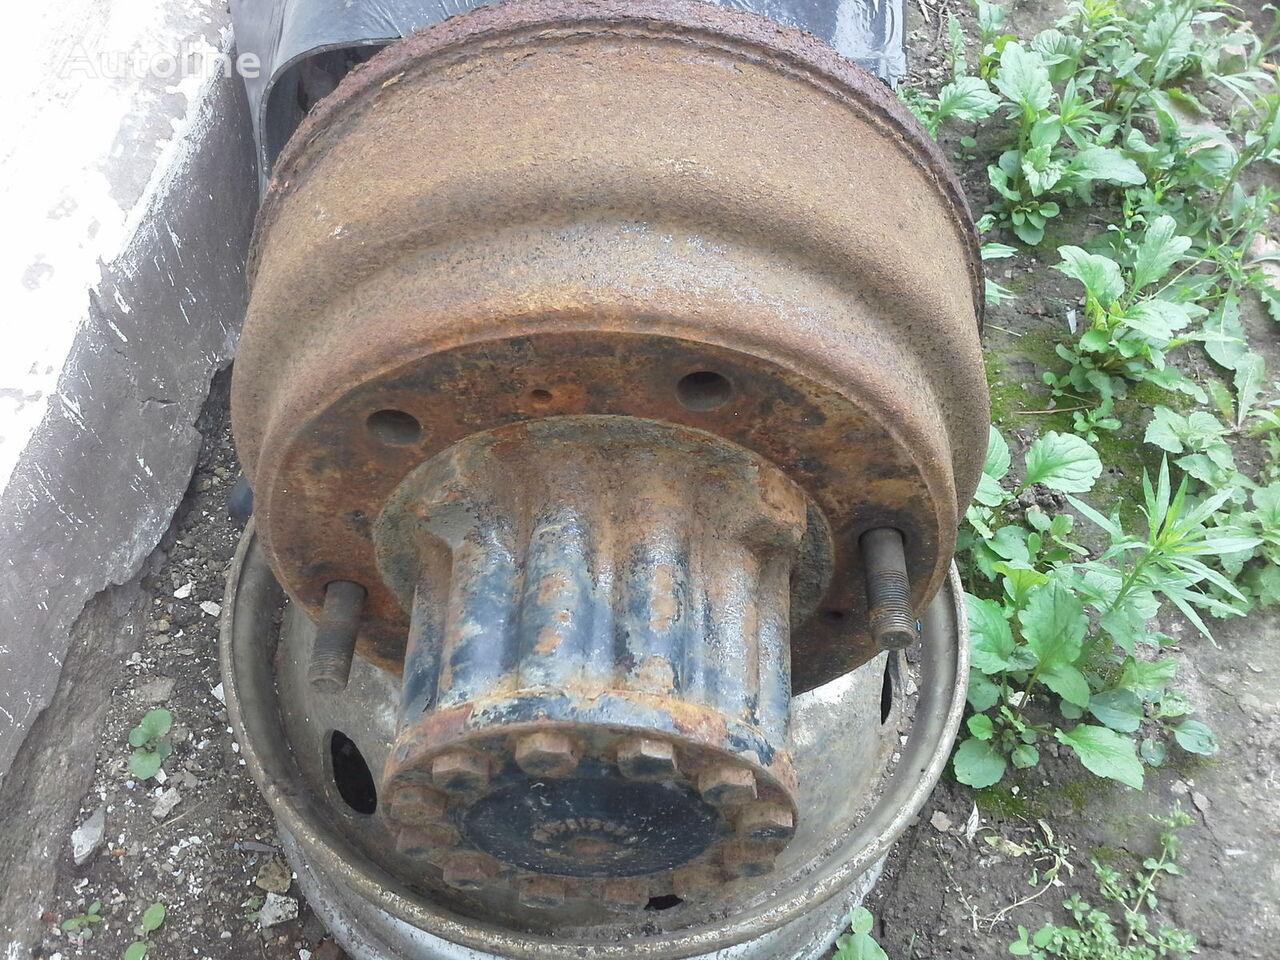 MAN-VW Tormoznoy cylindr Avrazborka MAN brake drum for MAN-VW 8.150 9.150 10.150 truck